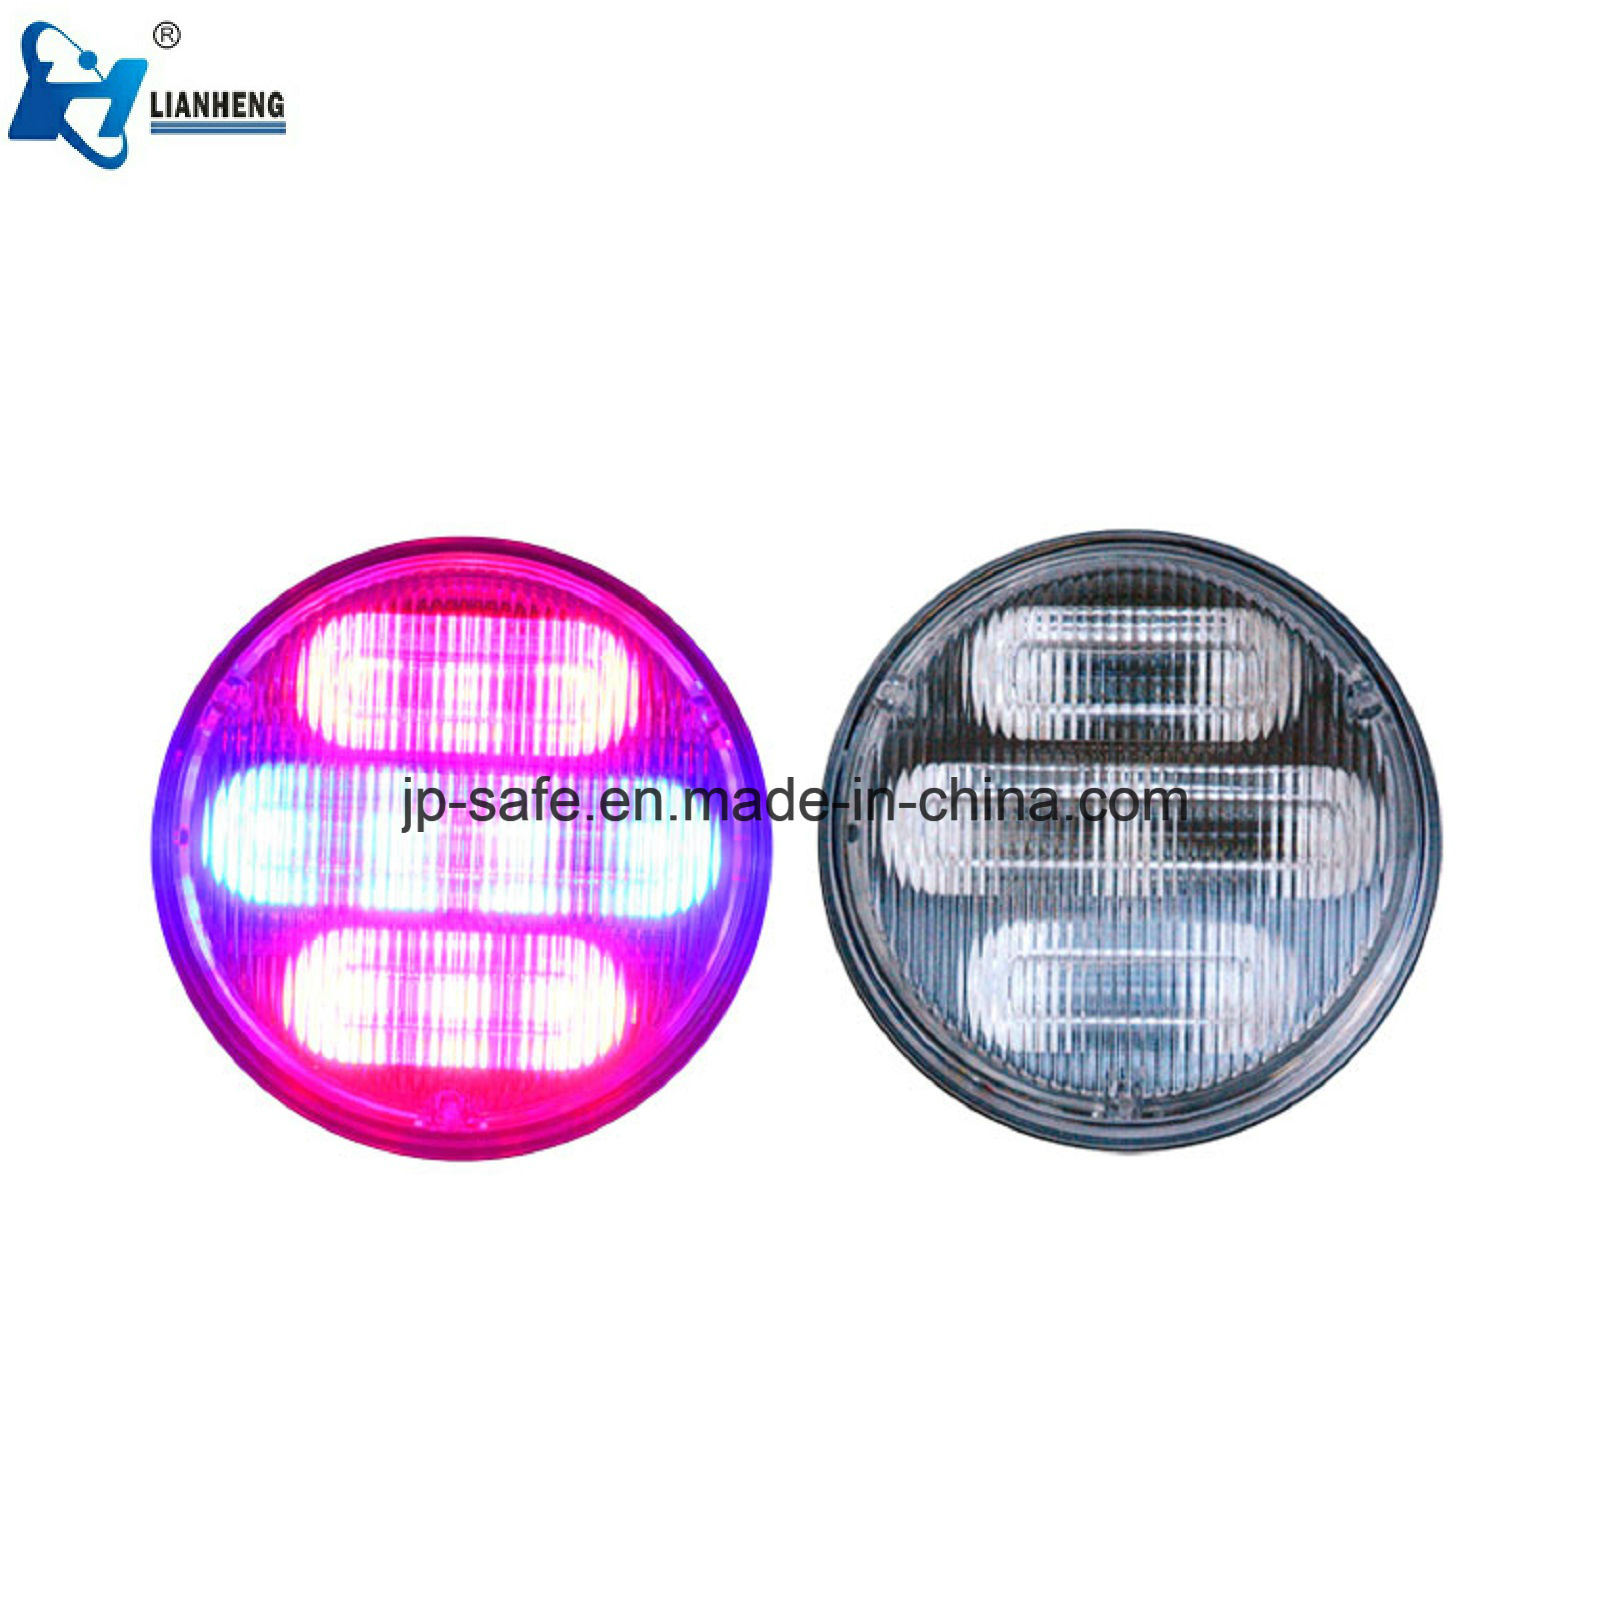 hight resolution of china tow truck fire ambulance car warning lights china warning strobe lights led flash lights